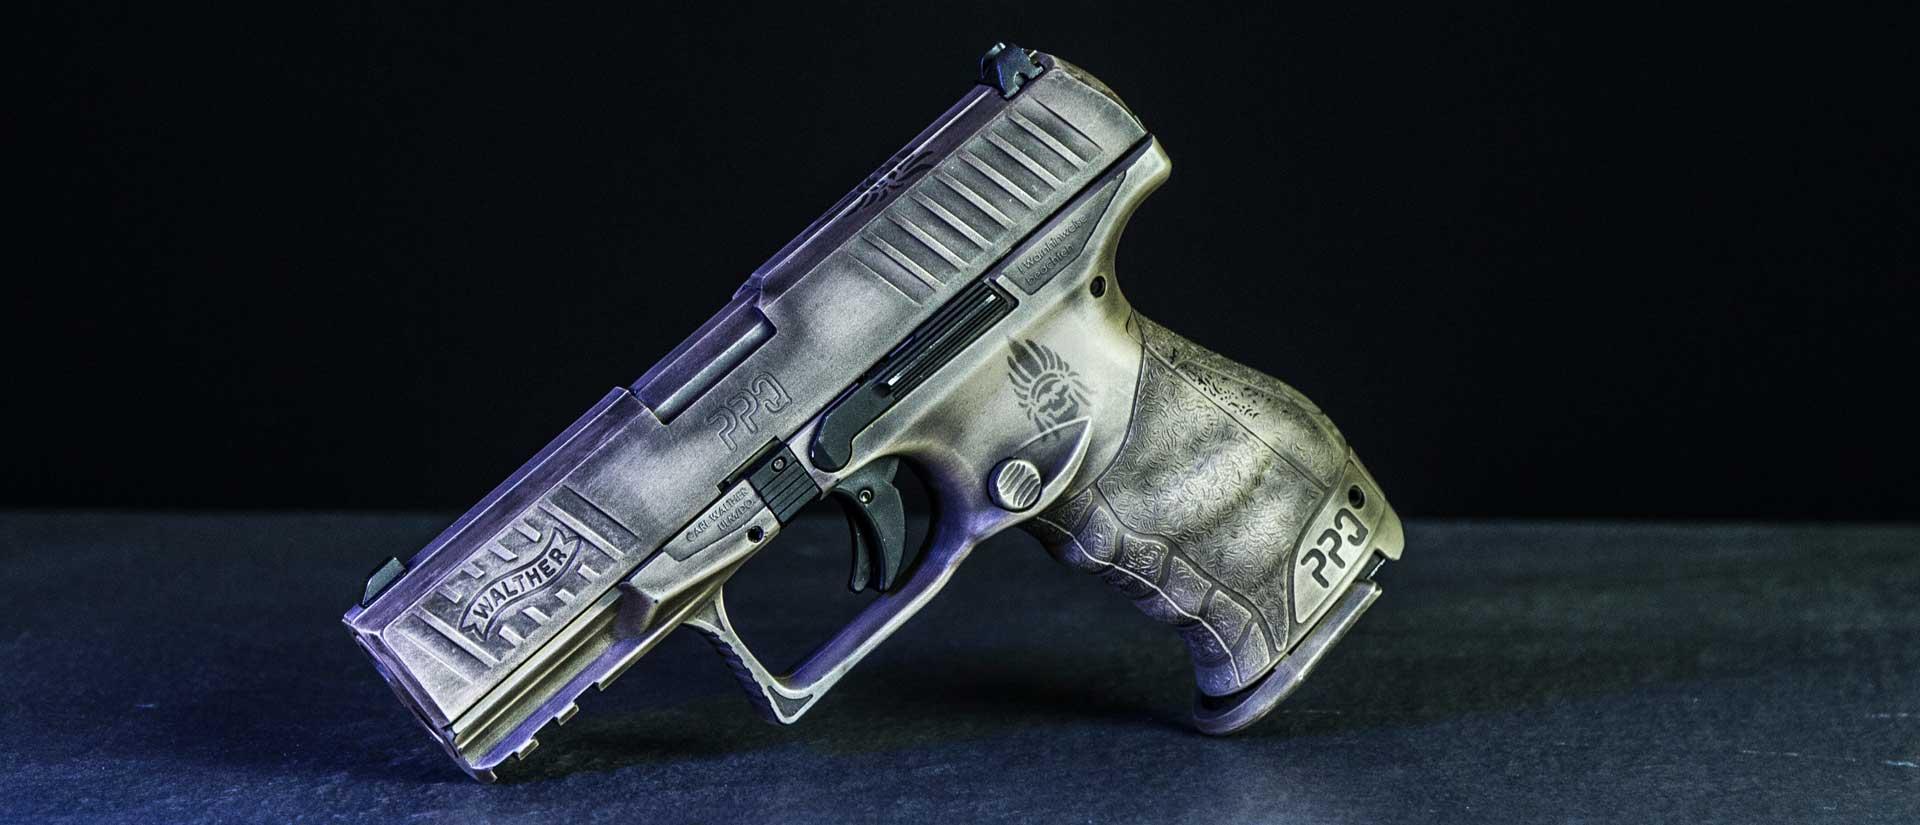 verex-tactical-tuning-waffen-pistole-glock-sig-sauer-17-cz-walther-visier-bruenieren-ar15-red-dot-beschichtung-tuning-cerakote-stippling-griptech-salzburg-slider-10